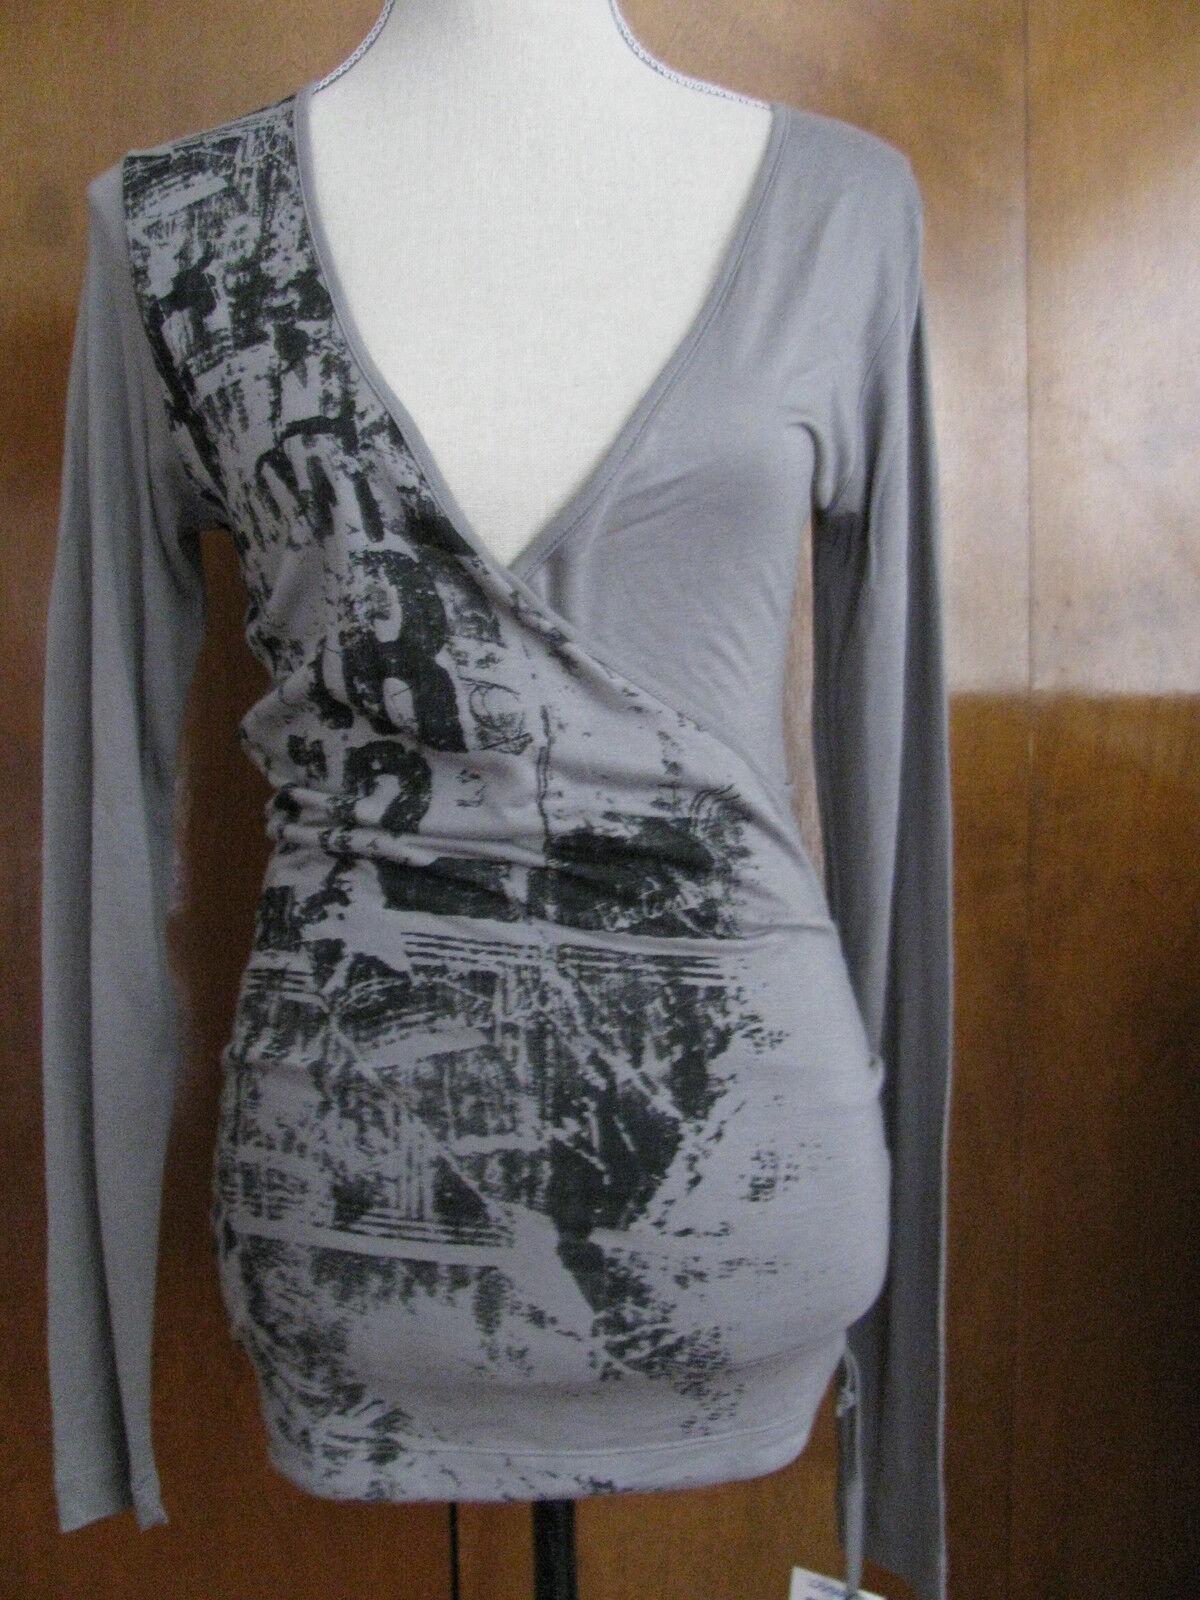 Anm clothing brand